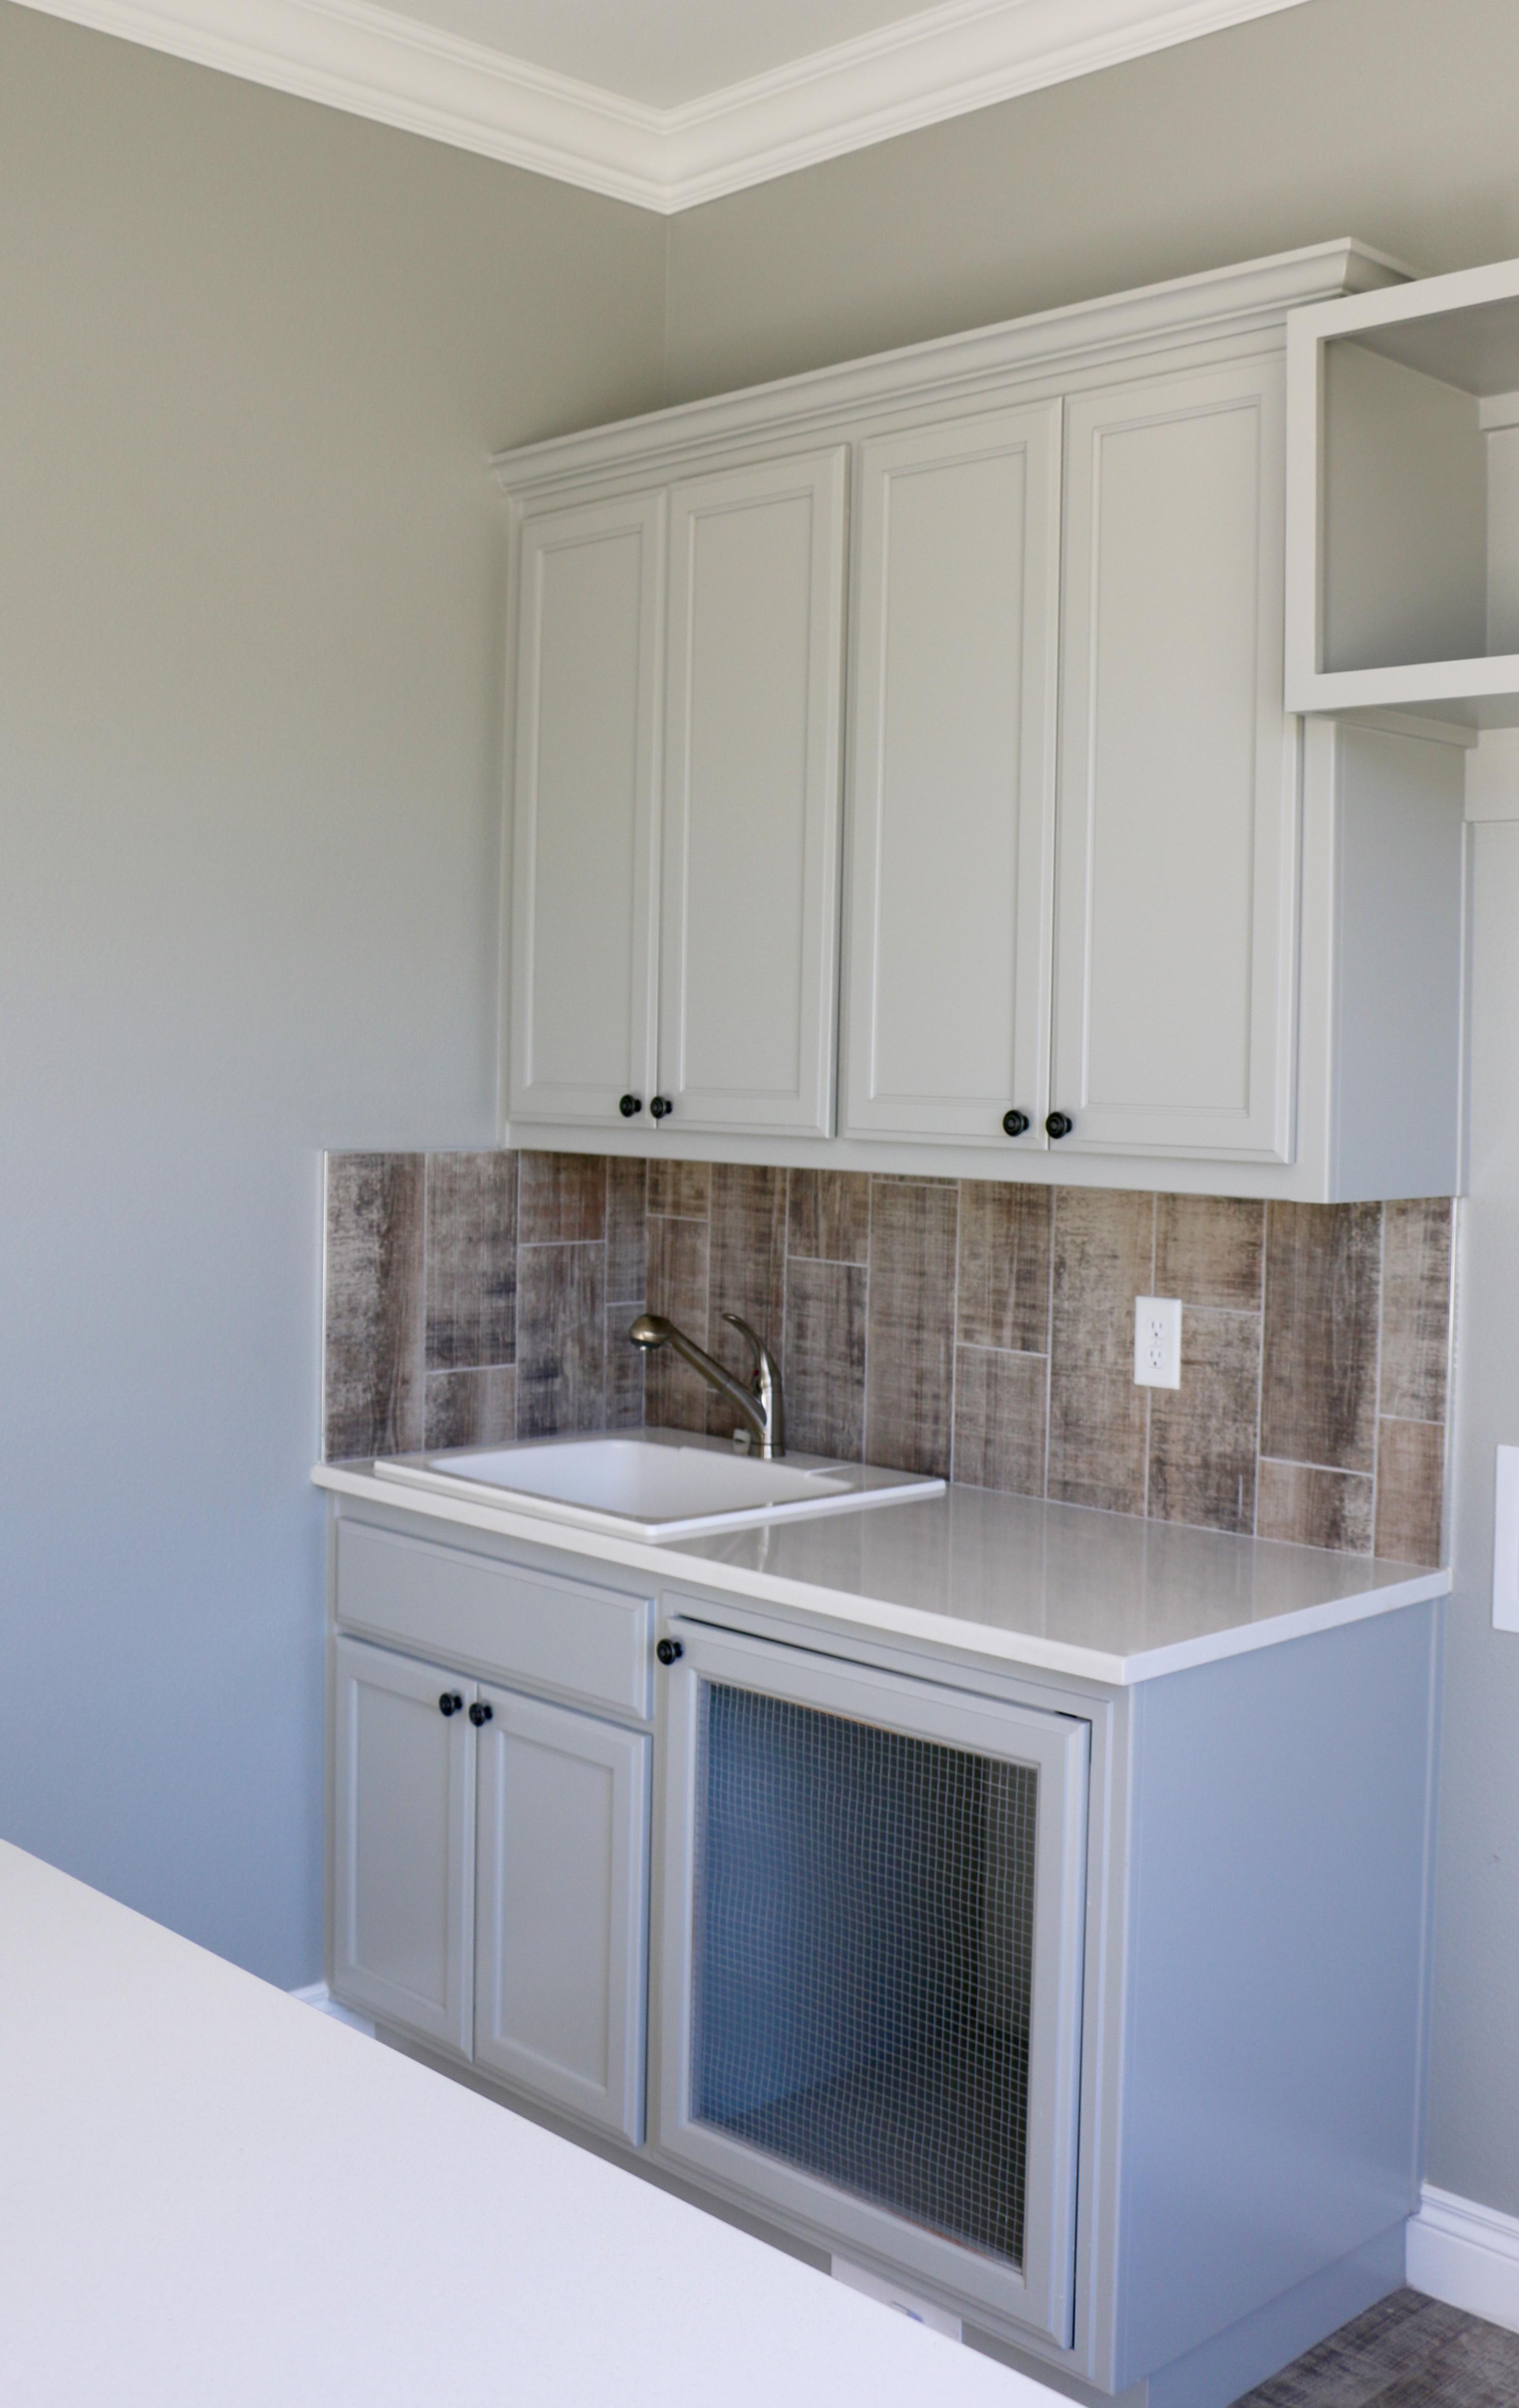 Utility room sink